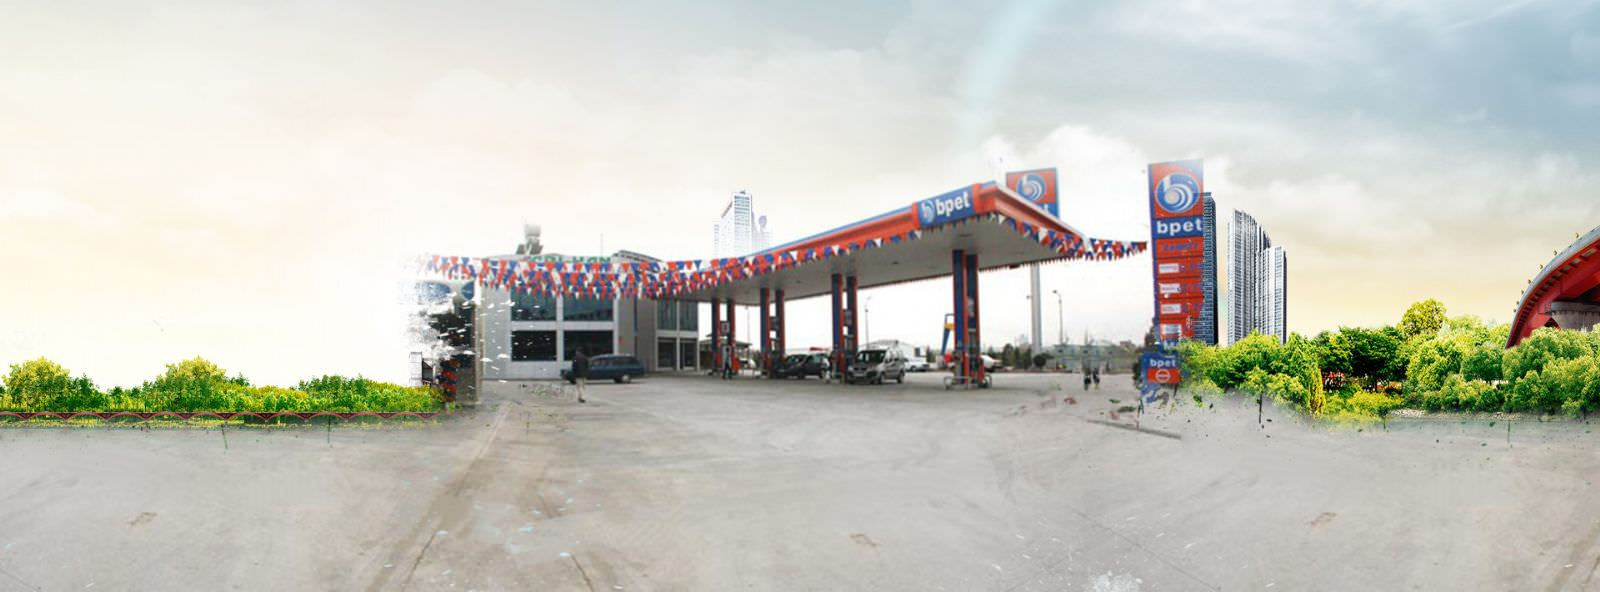 Zanpet Petrol